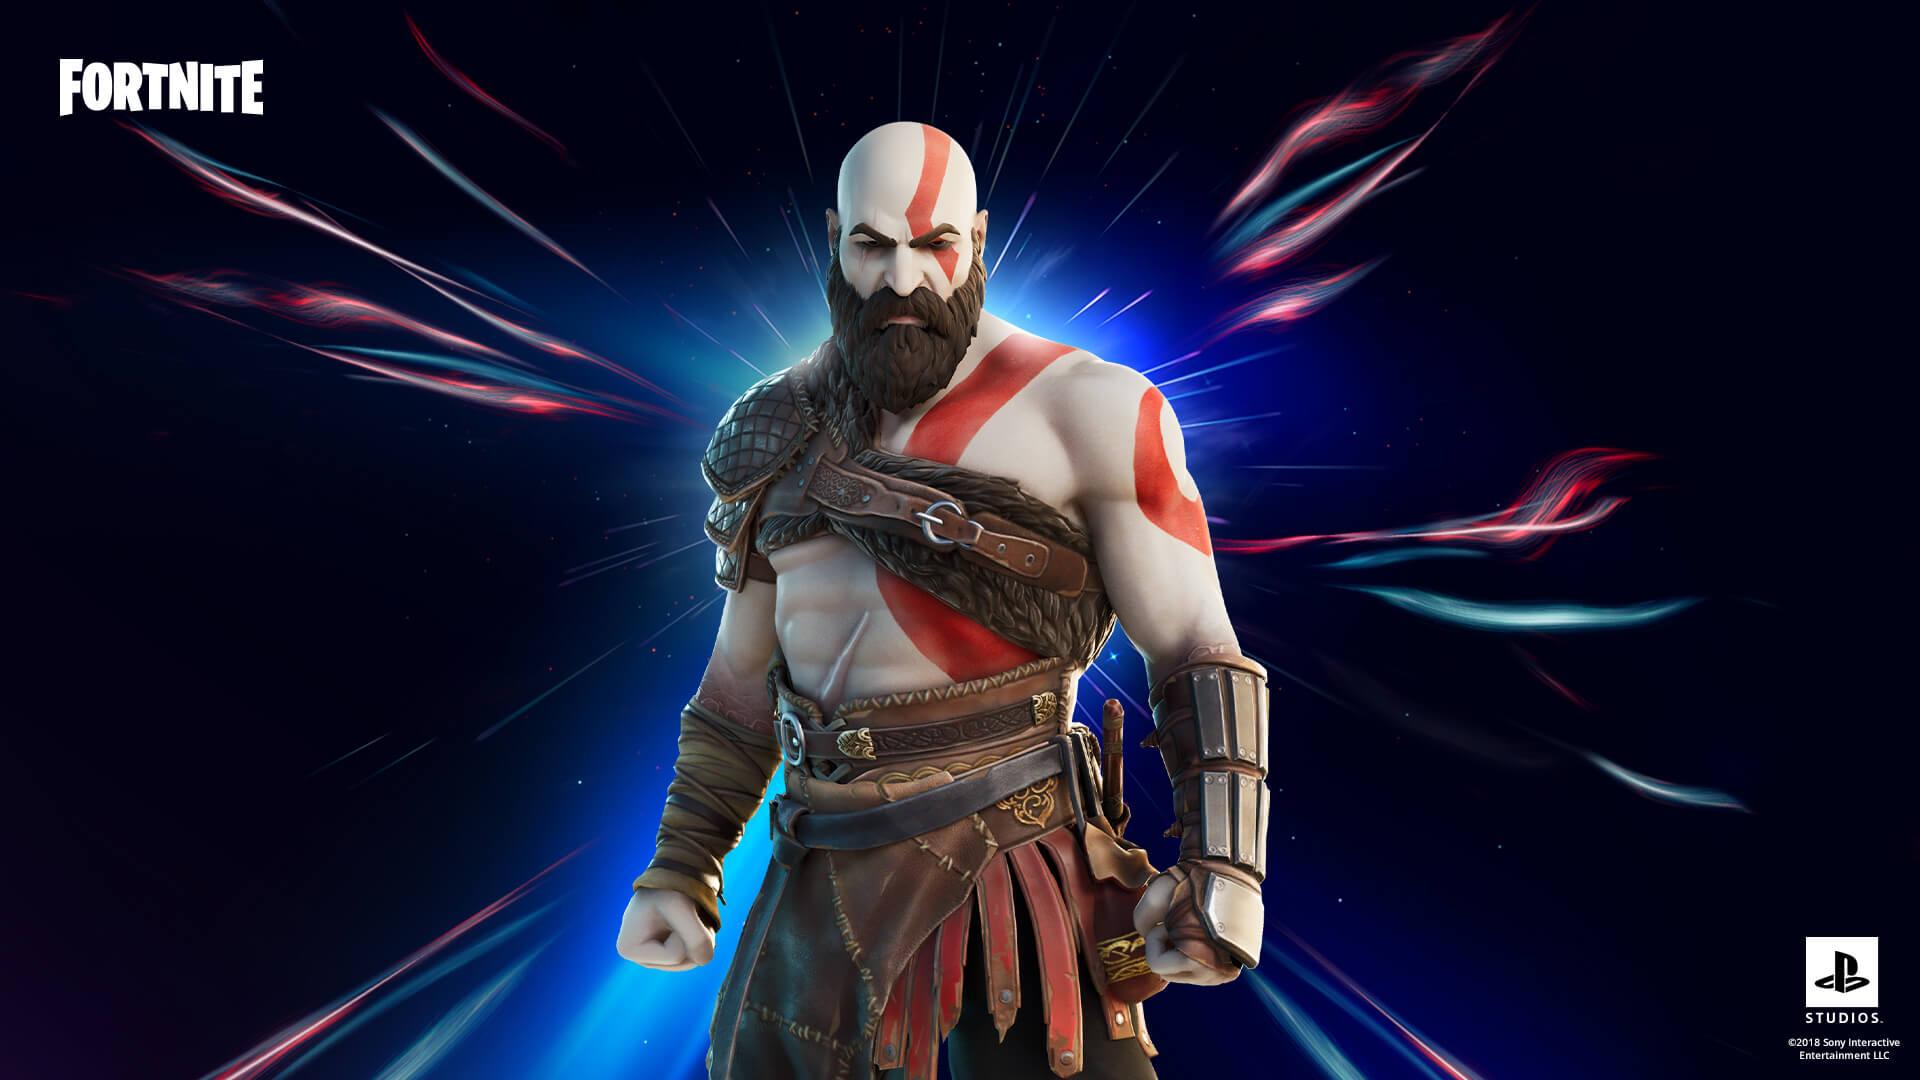 Media asset in full size related to 3dfxzone.it news item entitled as follows: Anche Kratos di God of War tra le novità del capitolo 2 stagione 5 di Fortnite  | Image Name: news31408_Fortnite-Kratos_1.jpg